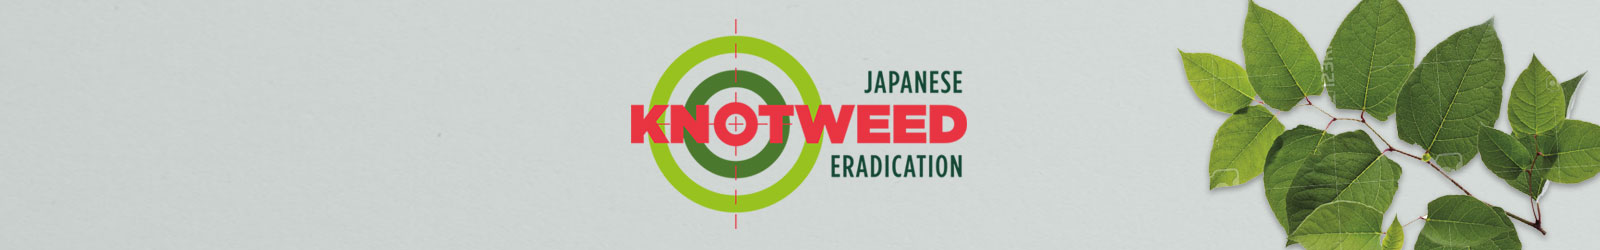 Japanese Knotweed Featured Image